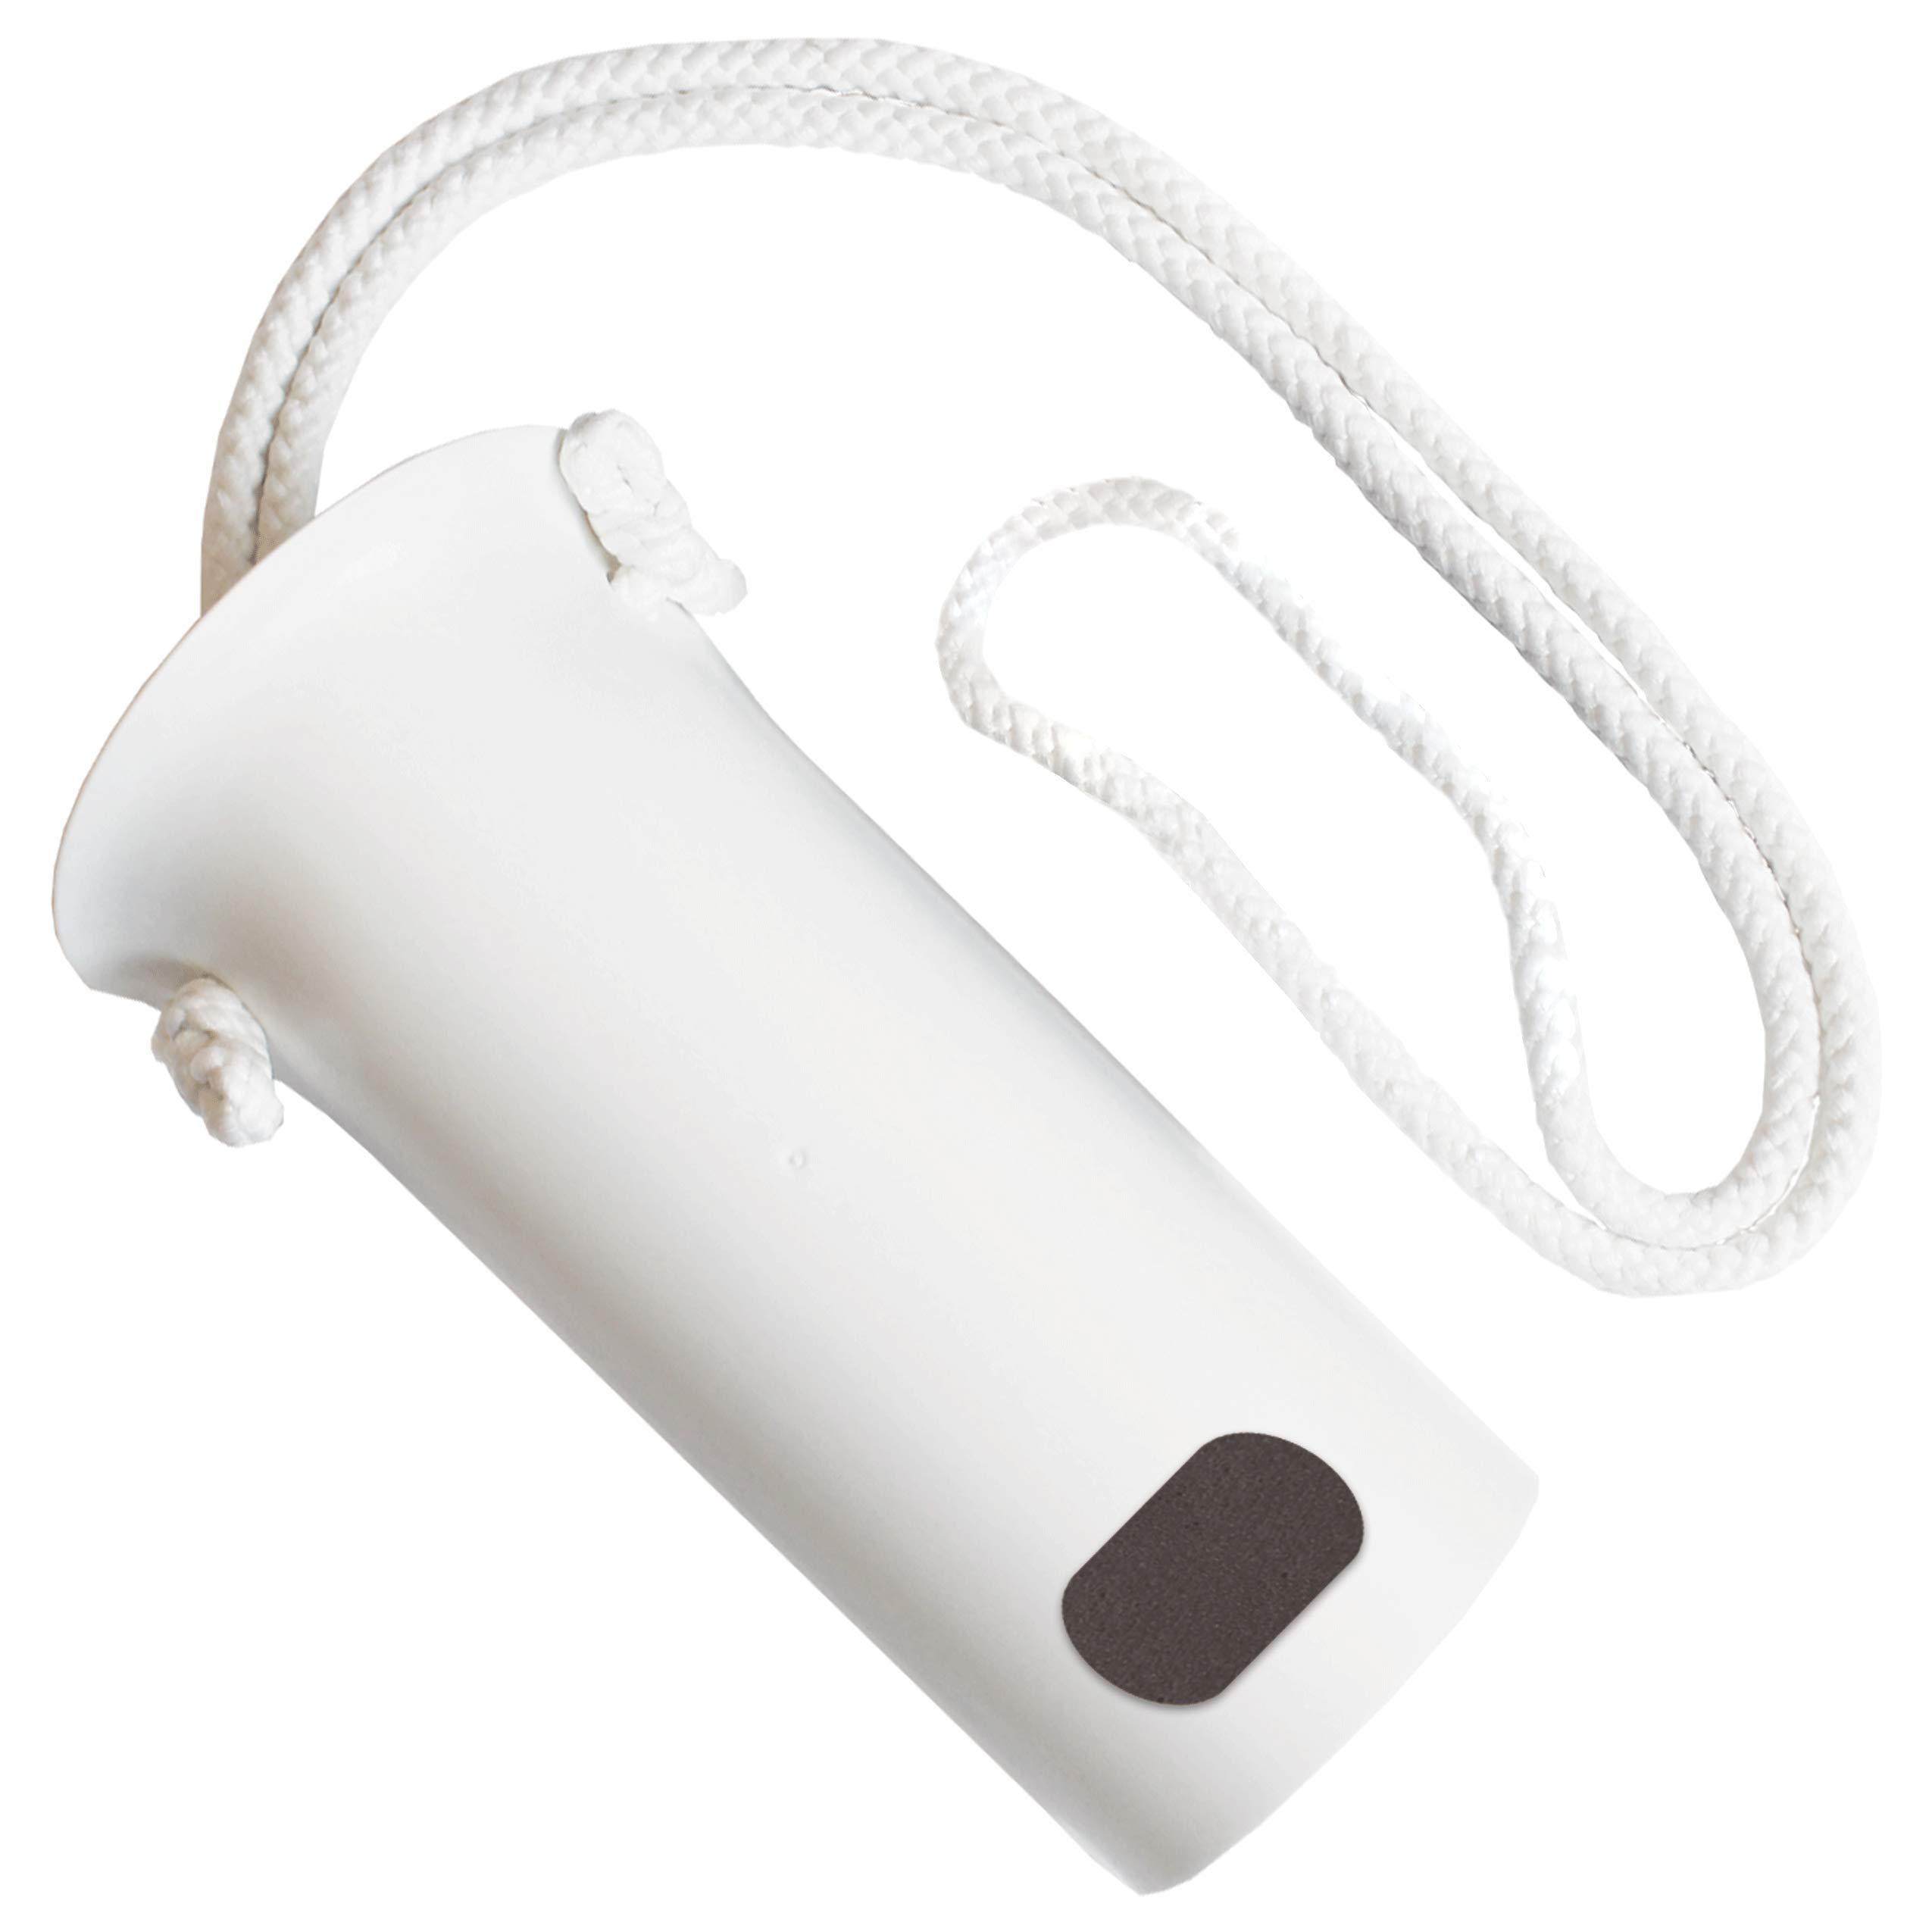 Sock Aid with Single Cord